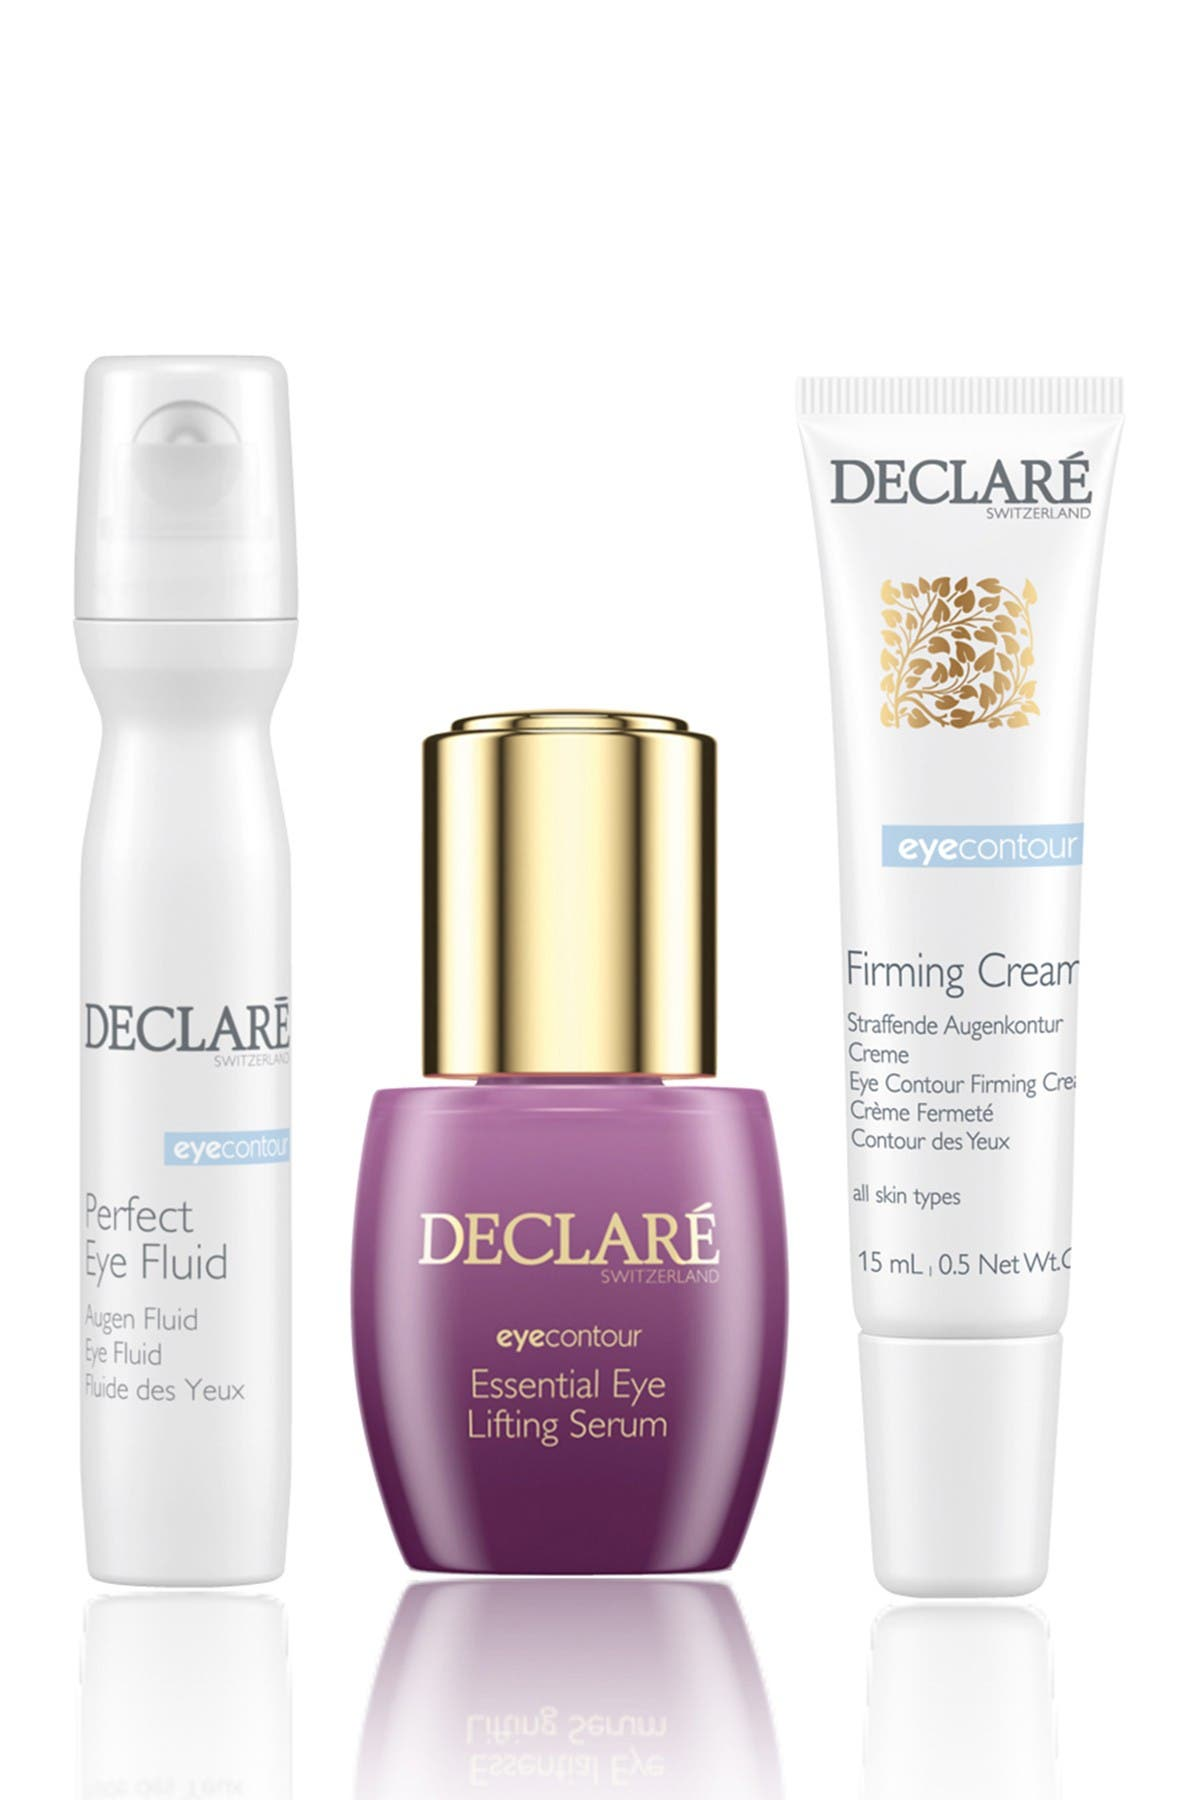 Image of DECLARE Anti-Wrinkle Eye 3-Piece Skincare Set